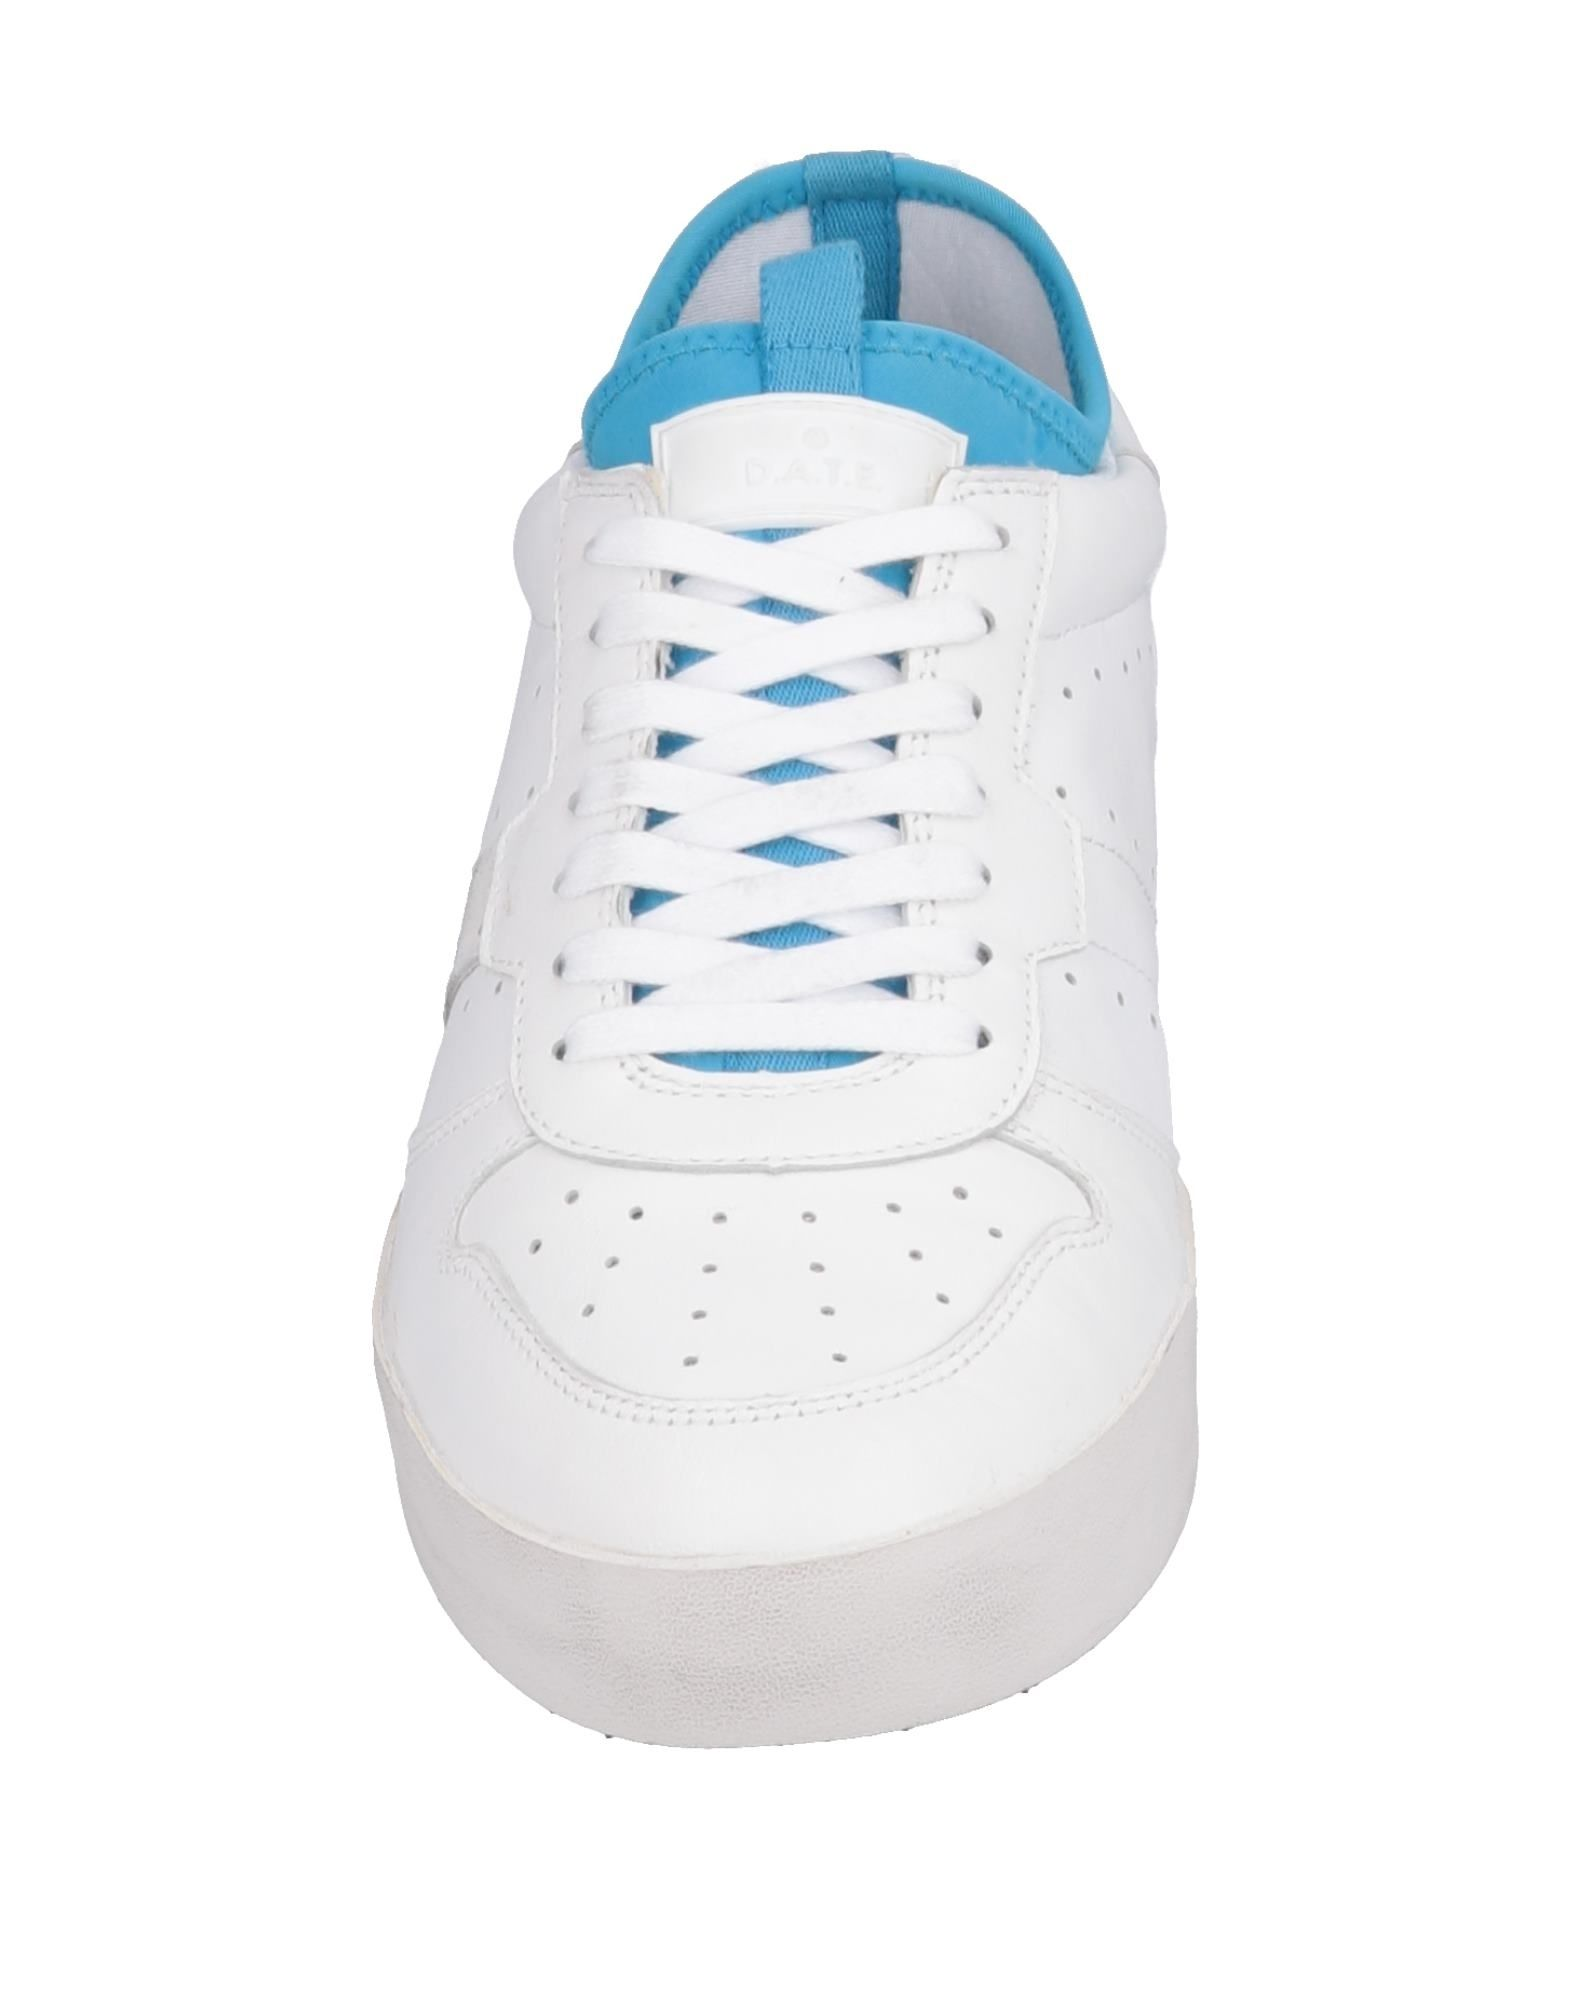 Rabatt echte Sneakers Schuhe D.A.T.E. Sneakers echte Herren  11554571HF 9f1995